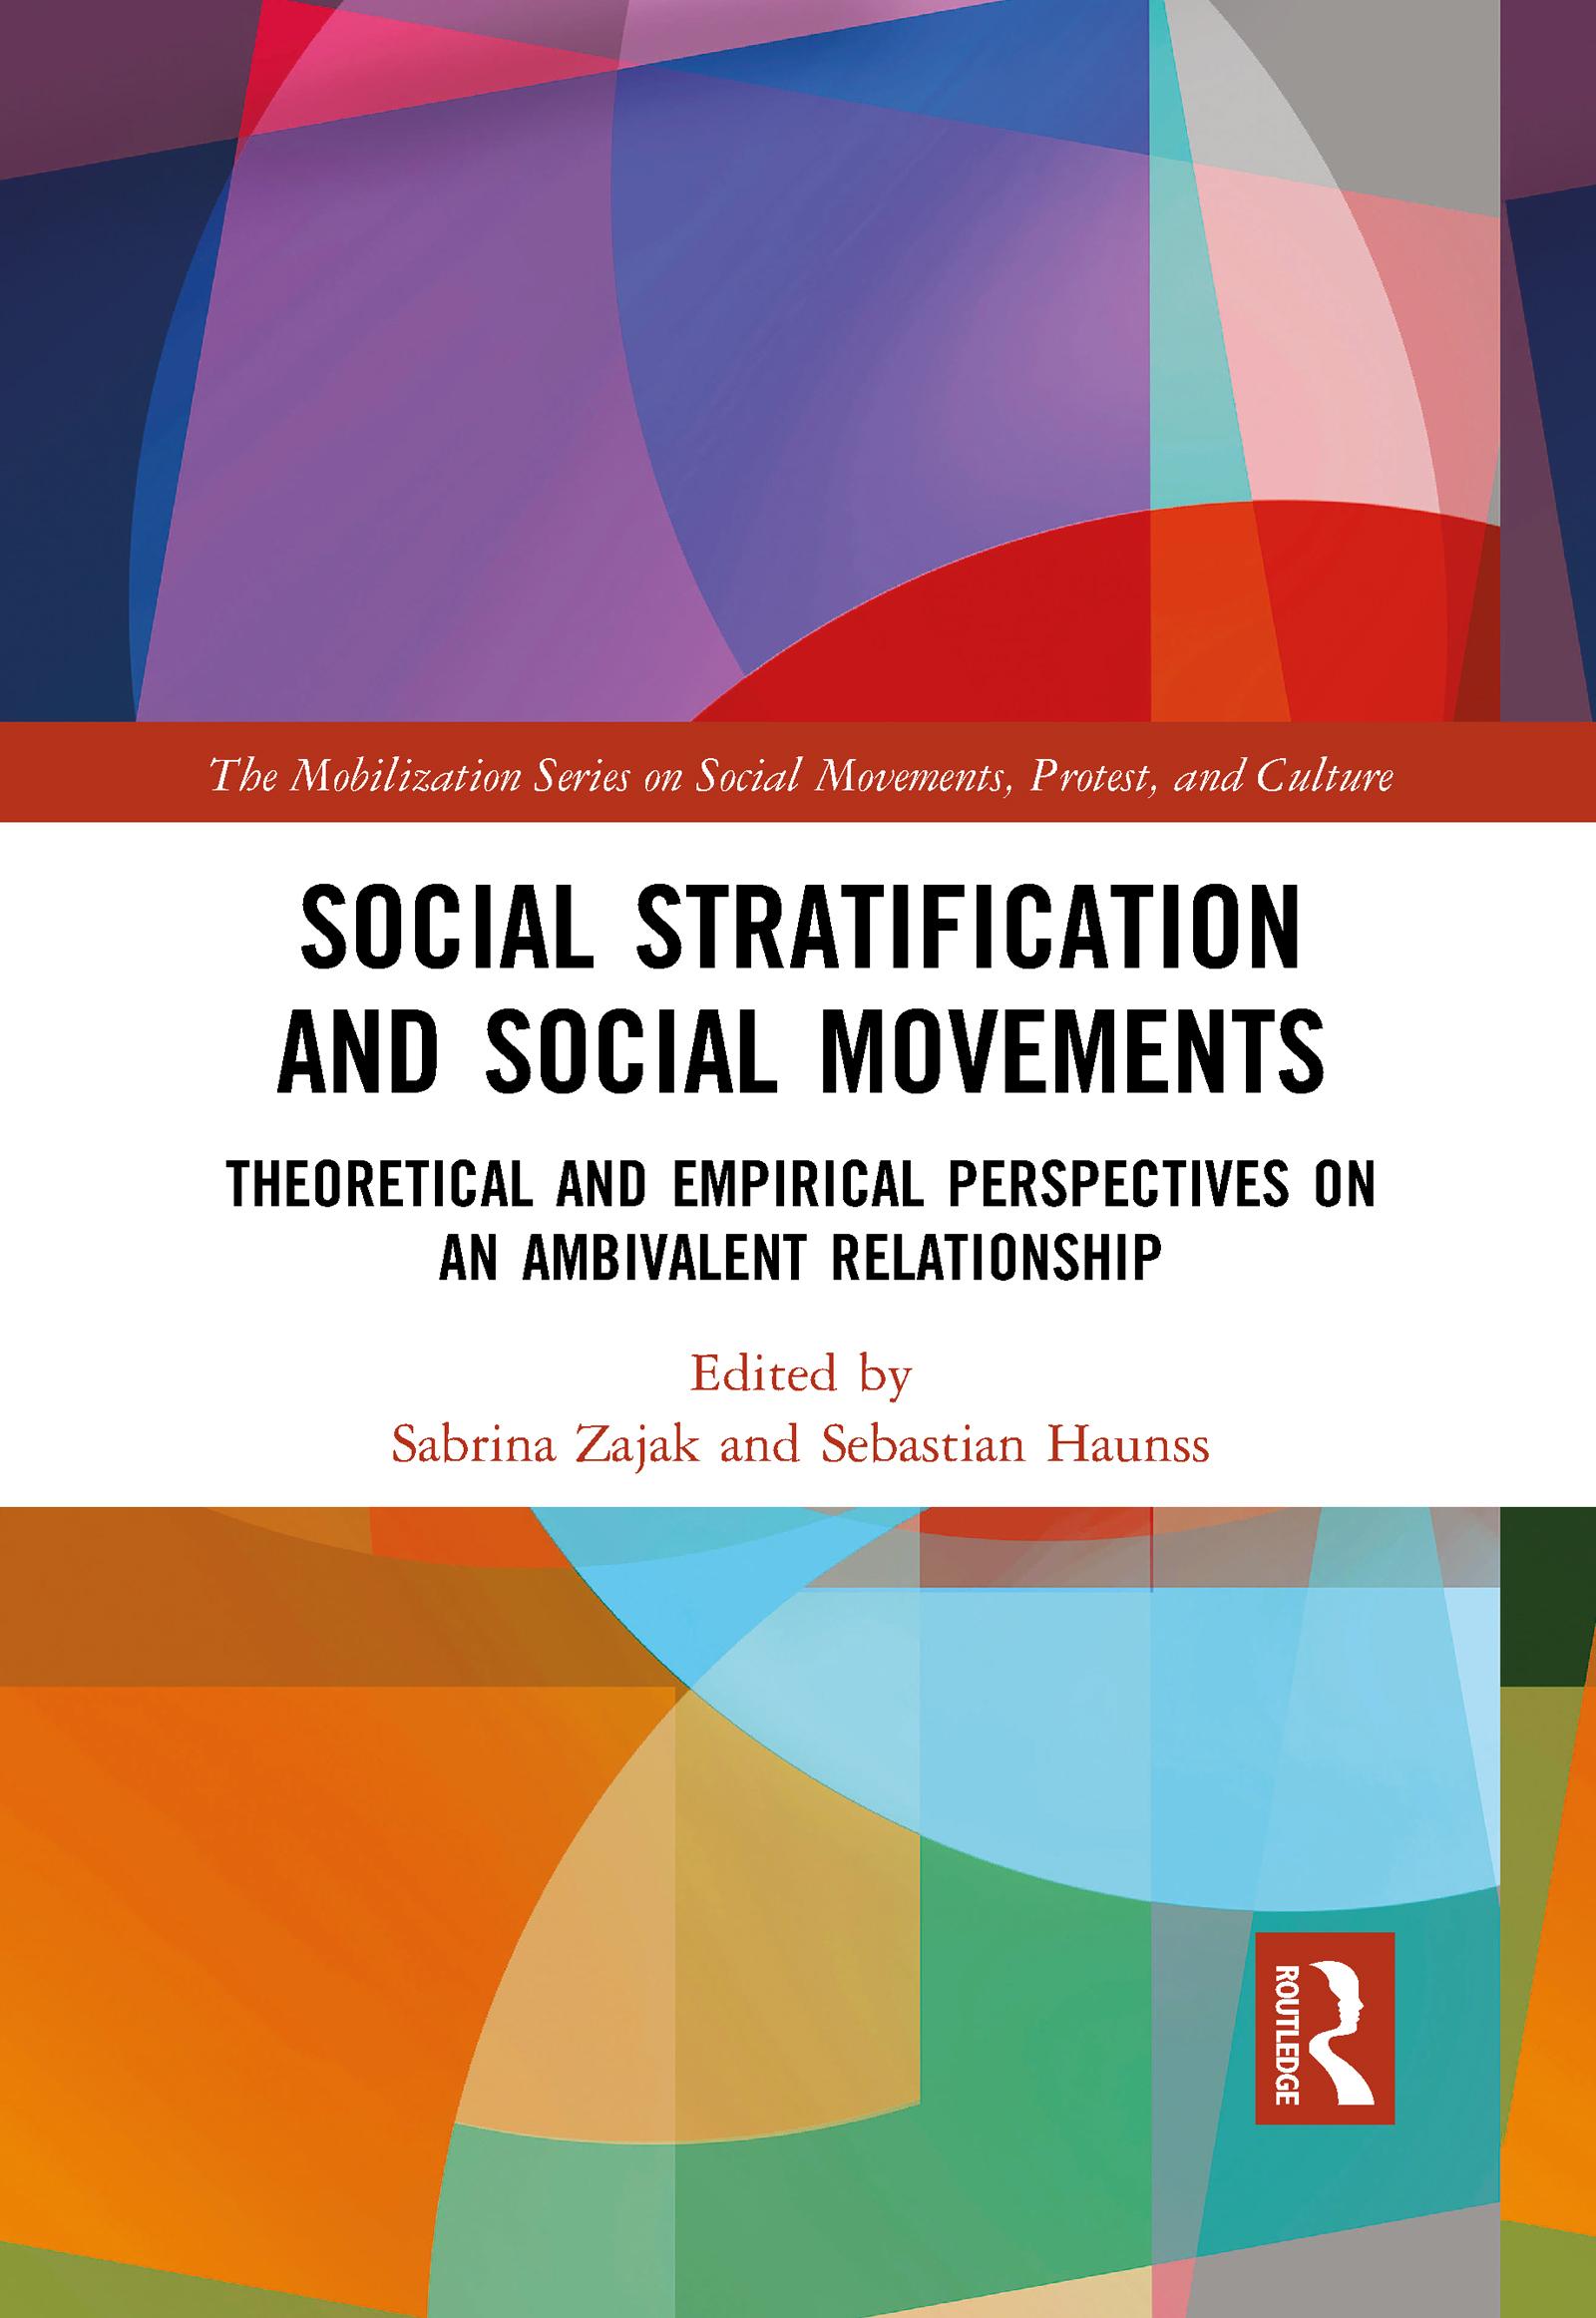 Social Stratification and Social Movements